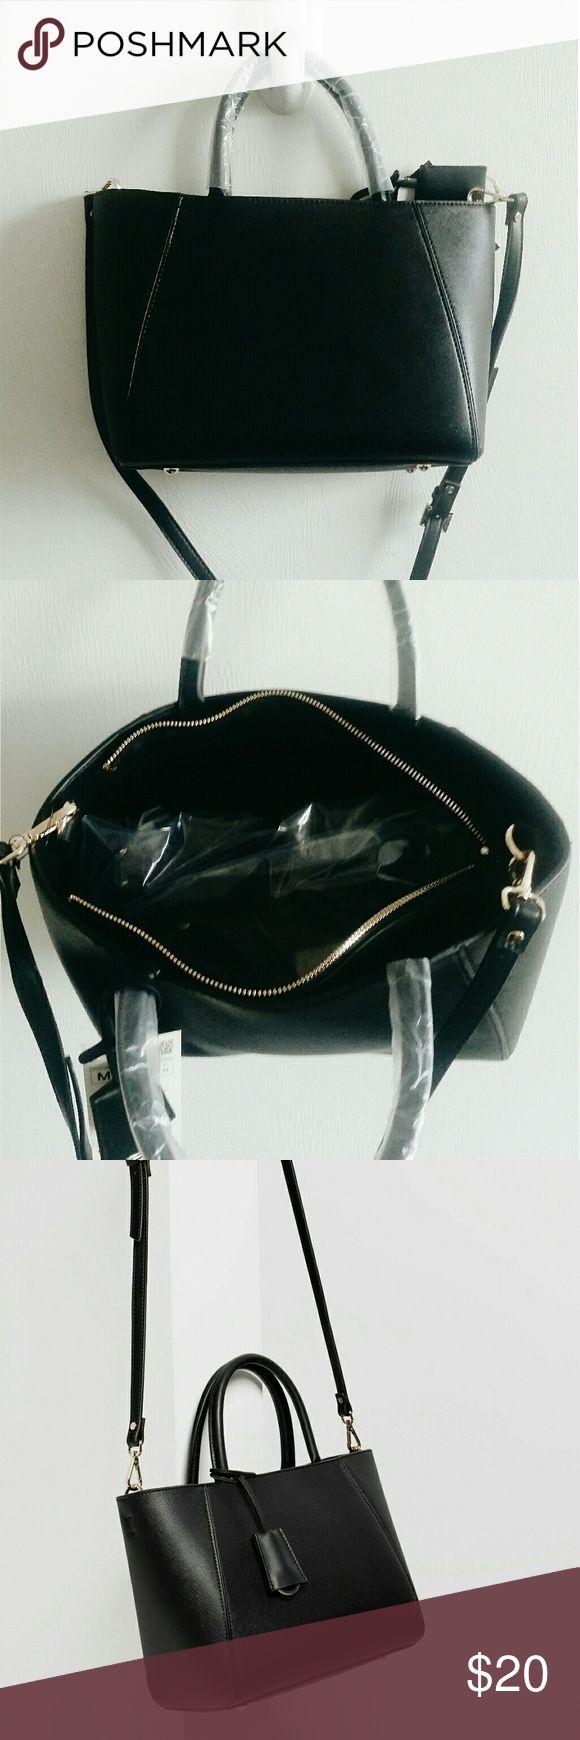 Tote Bag Black Zara Tote Bag, Unused with Tags. Zara Bags Totes